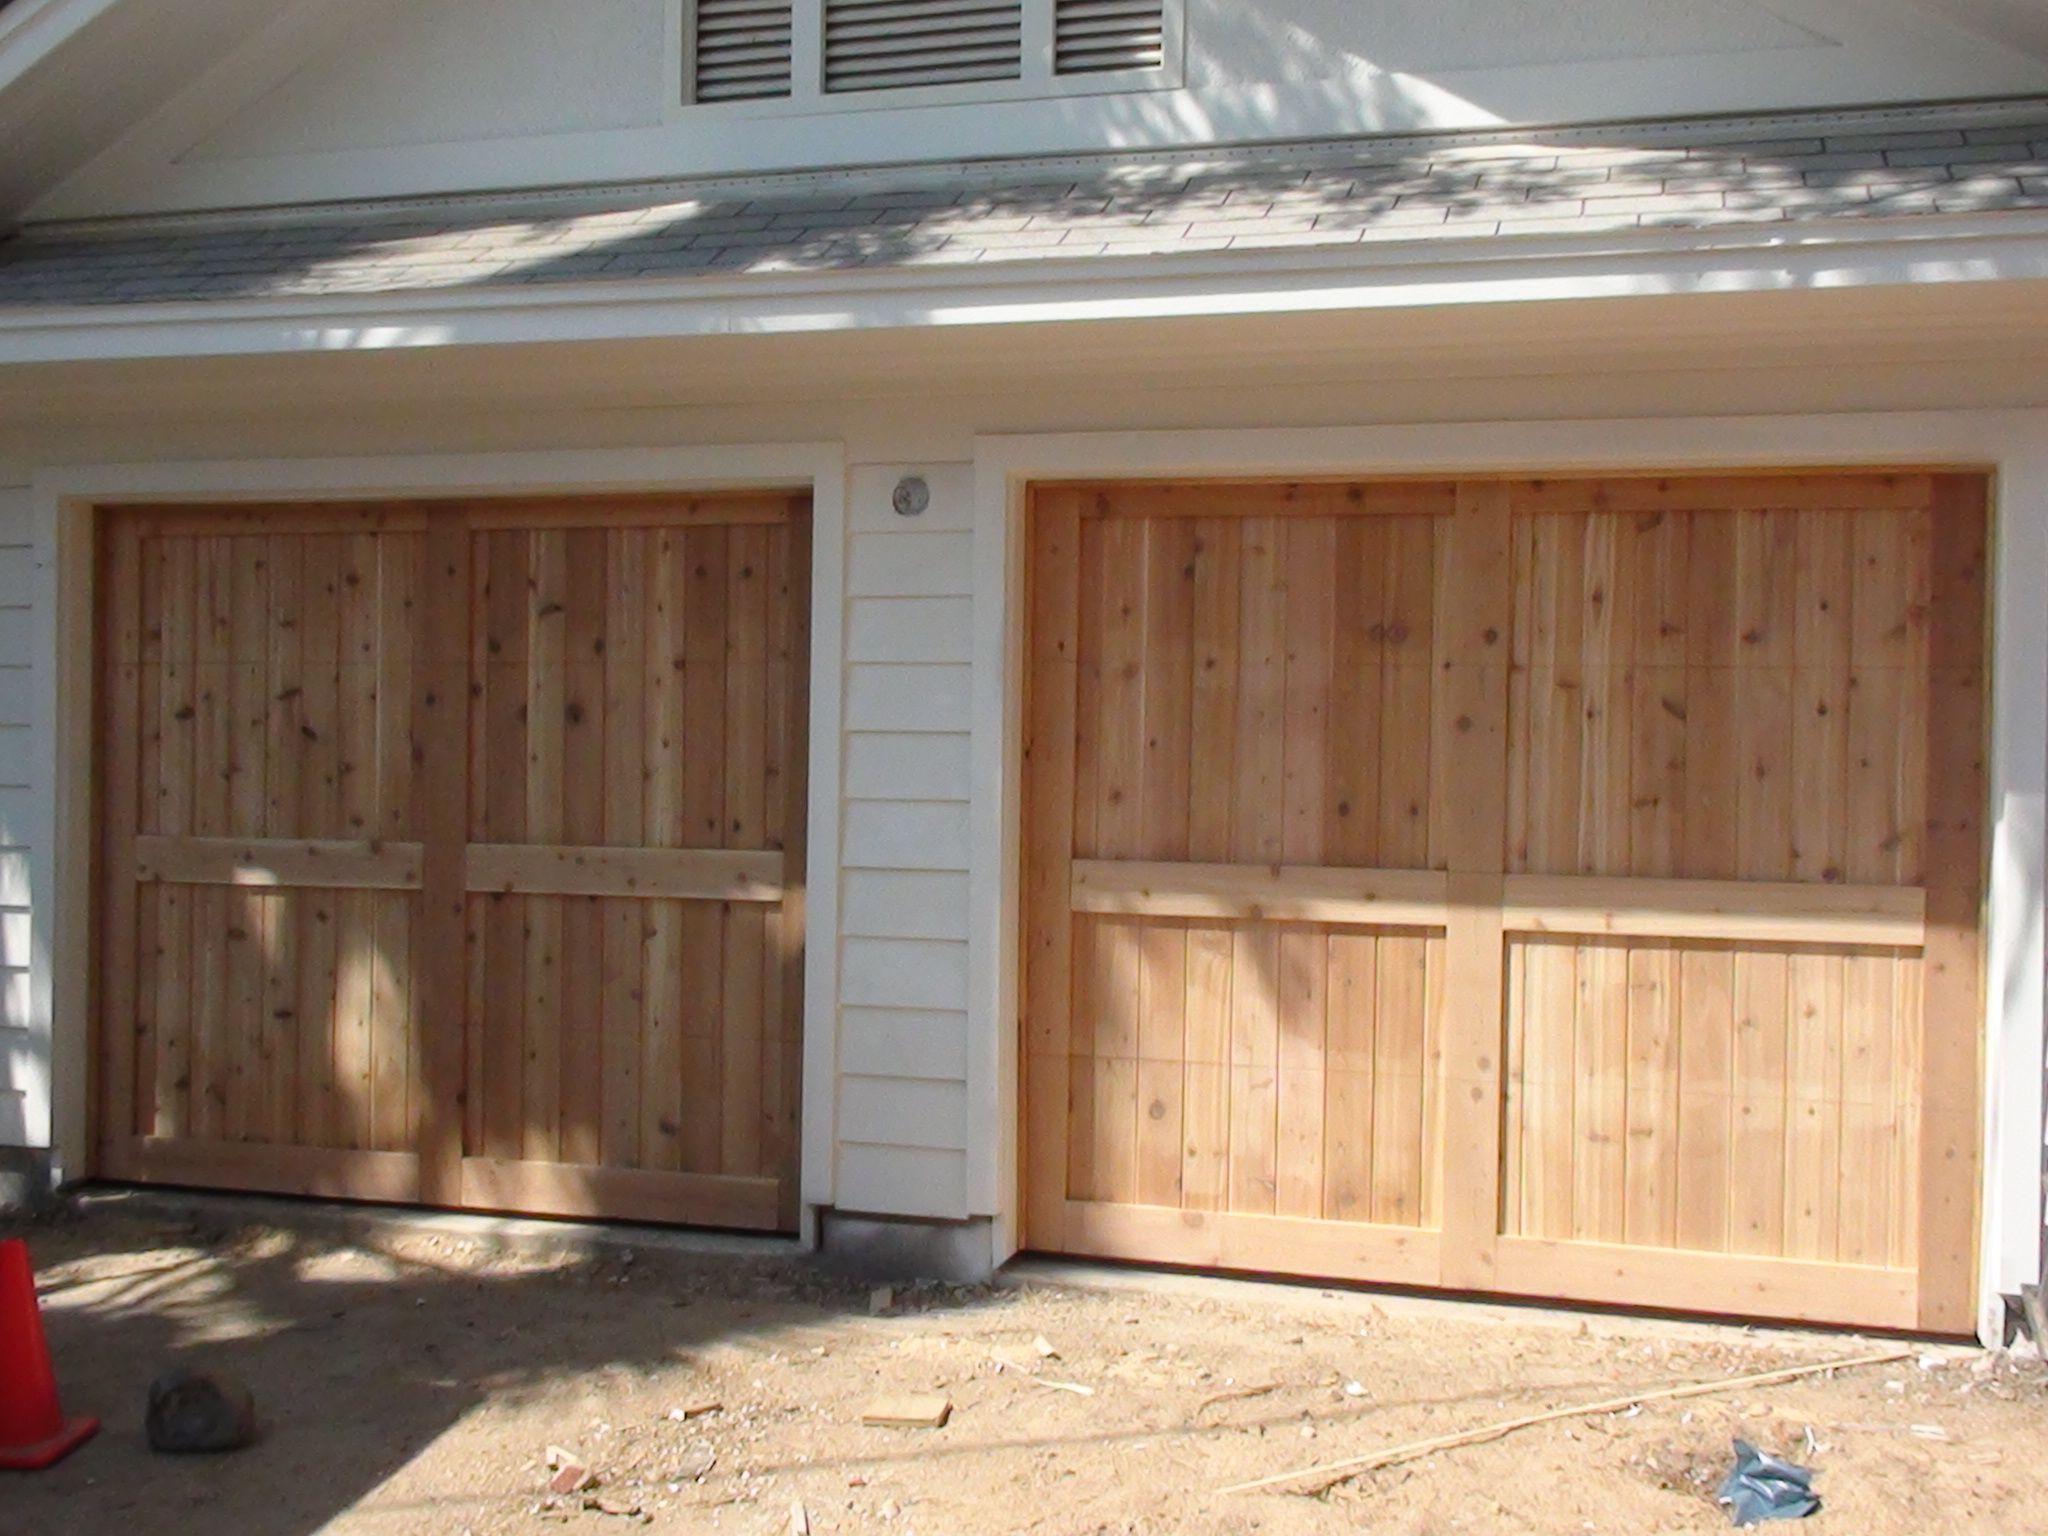 1536 #A1662A 8x7 Wood Garage Door Cedar Natural Architecture Pinterest image Wood Garage Doors Houston 35932048